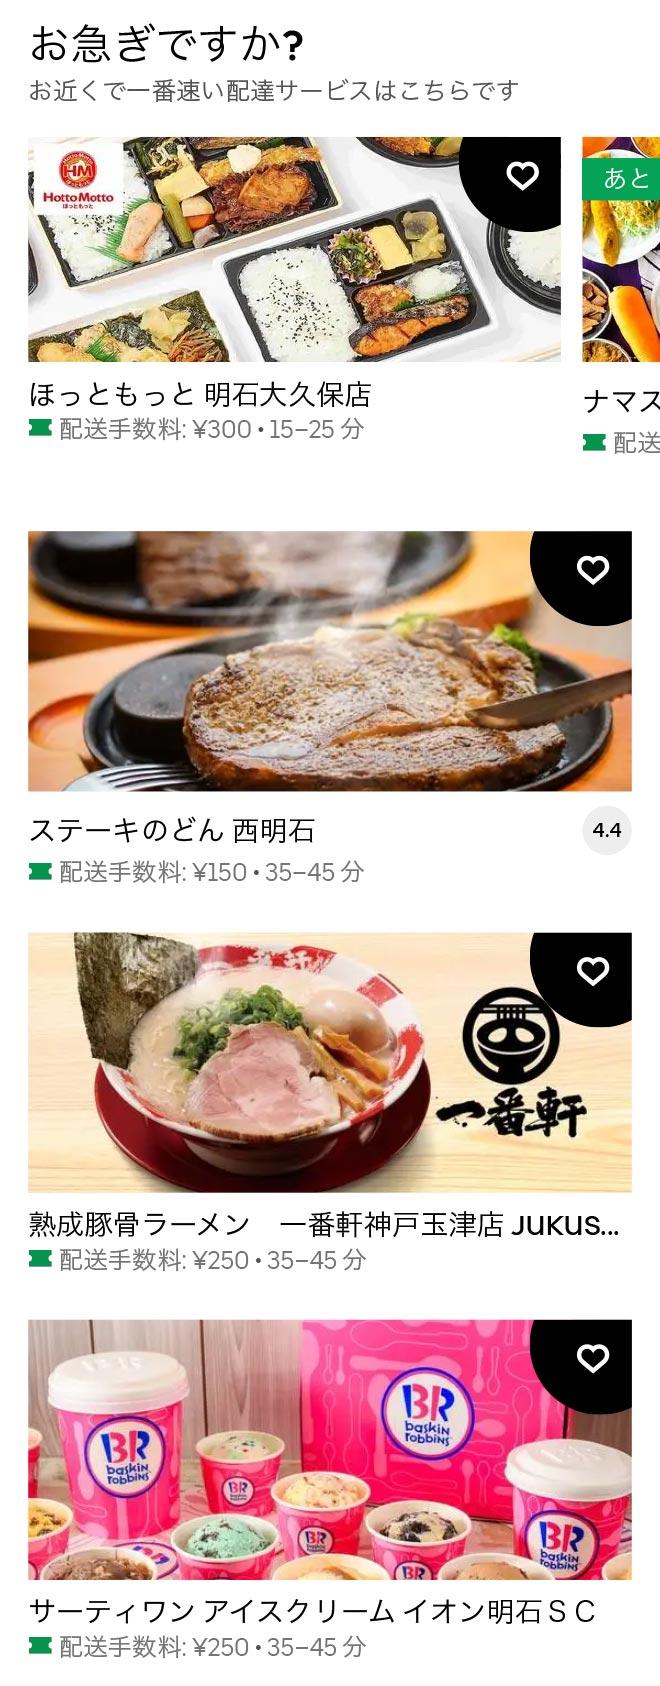 U nishi akashi 2103 10